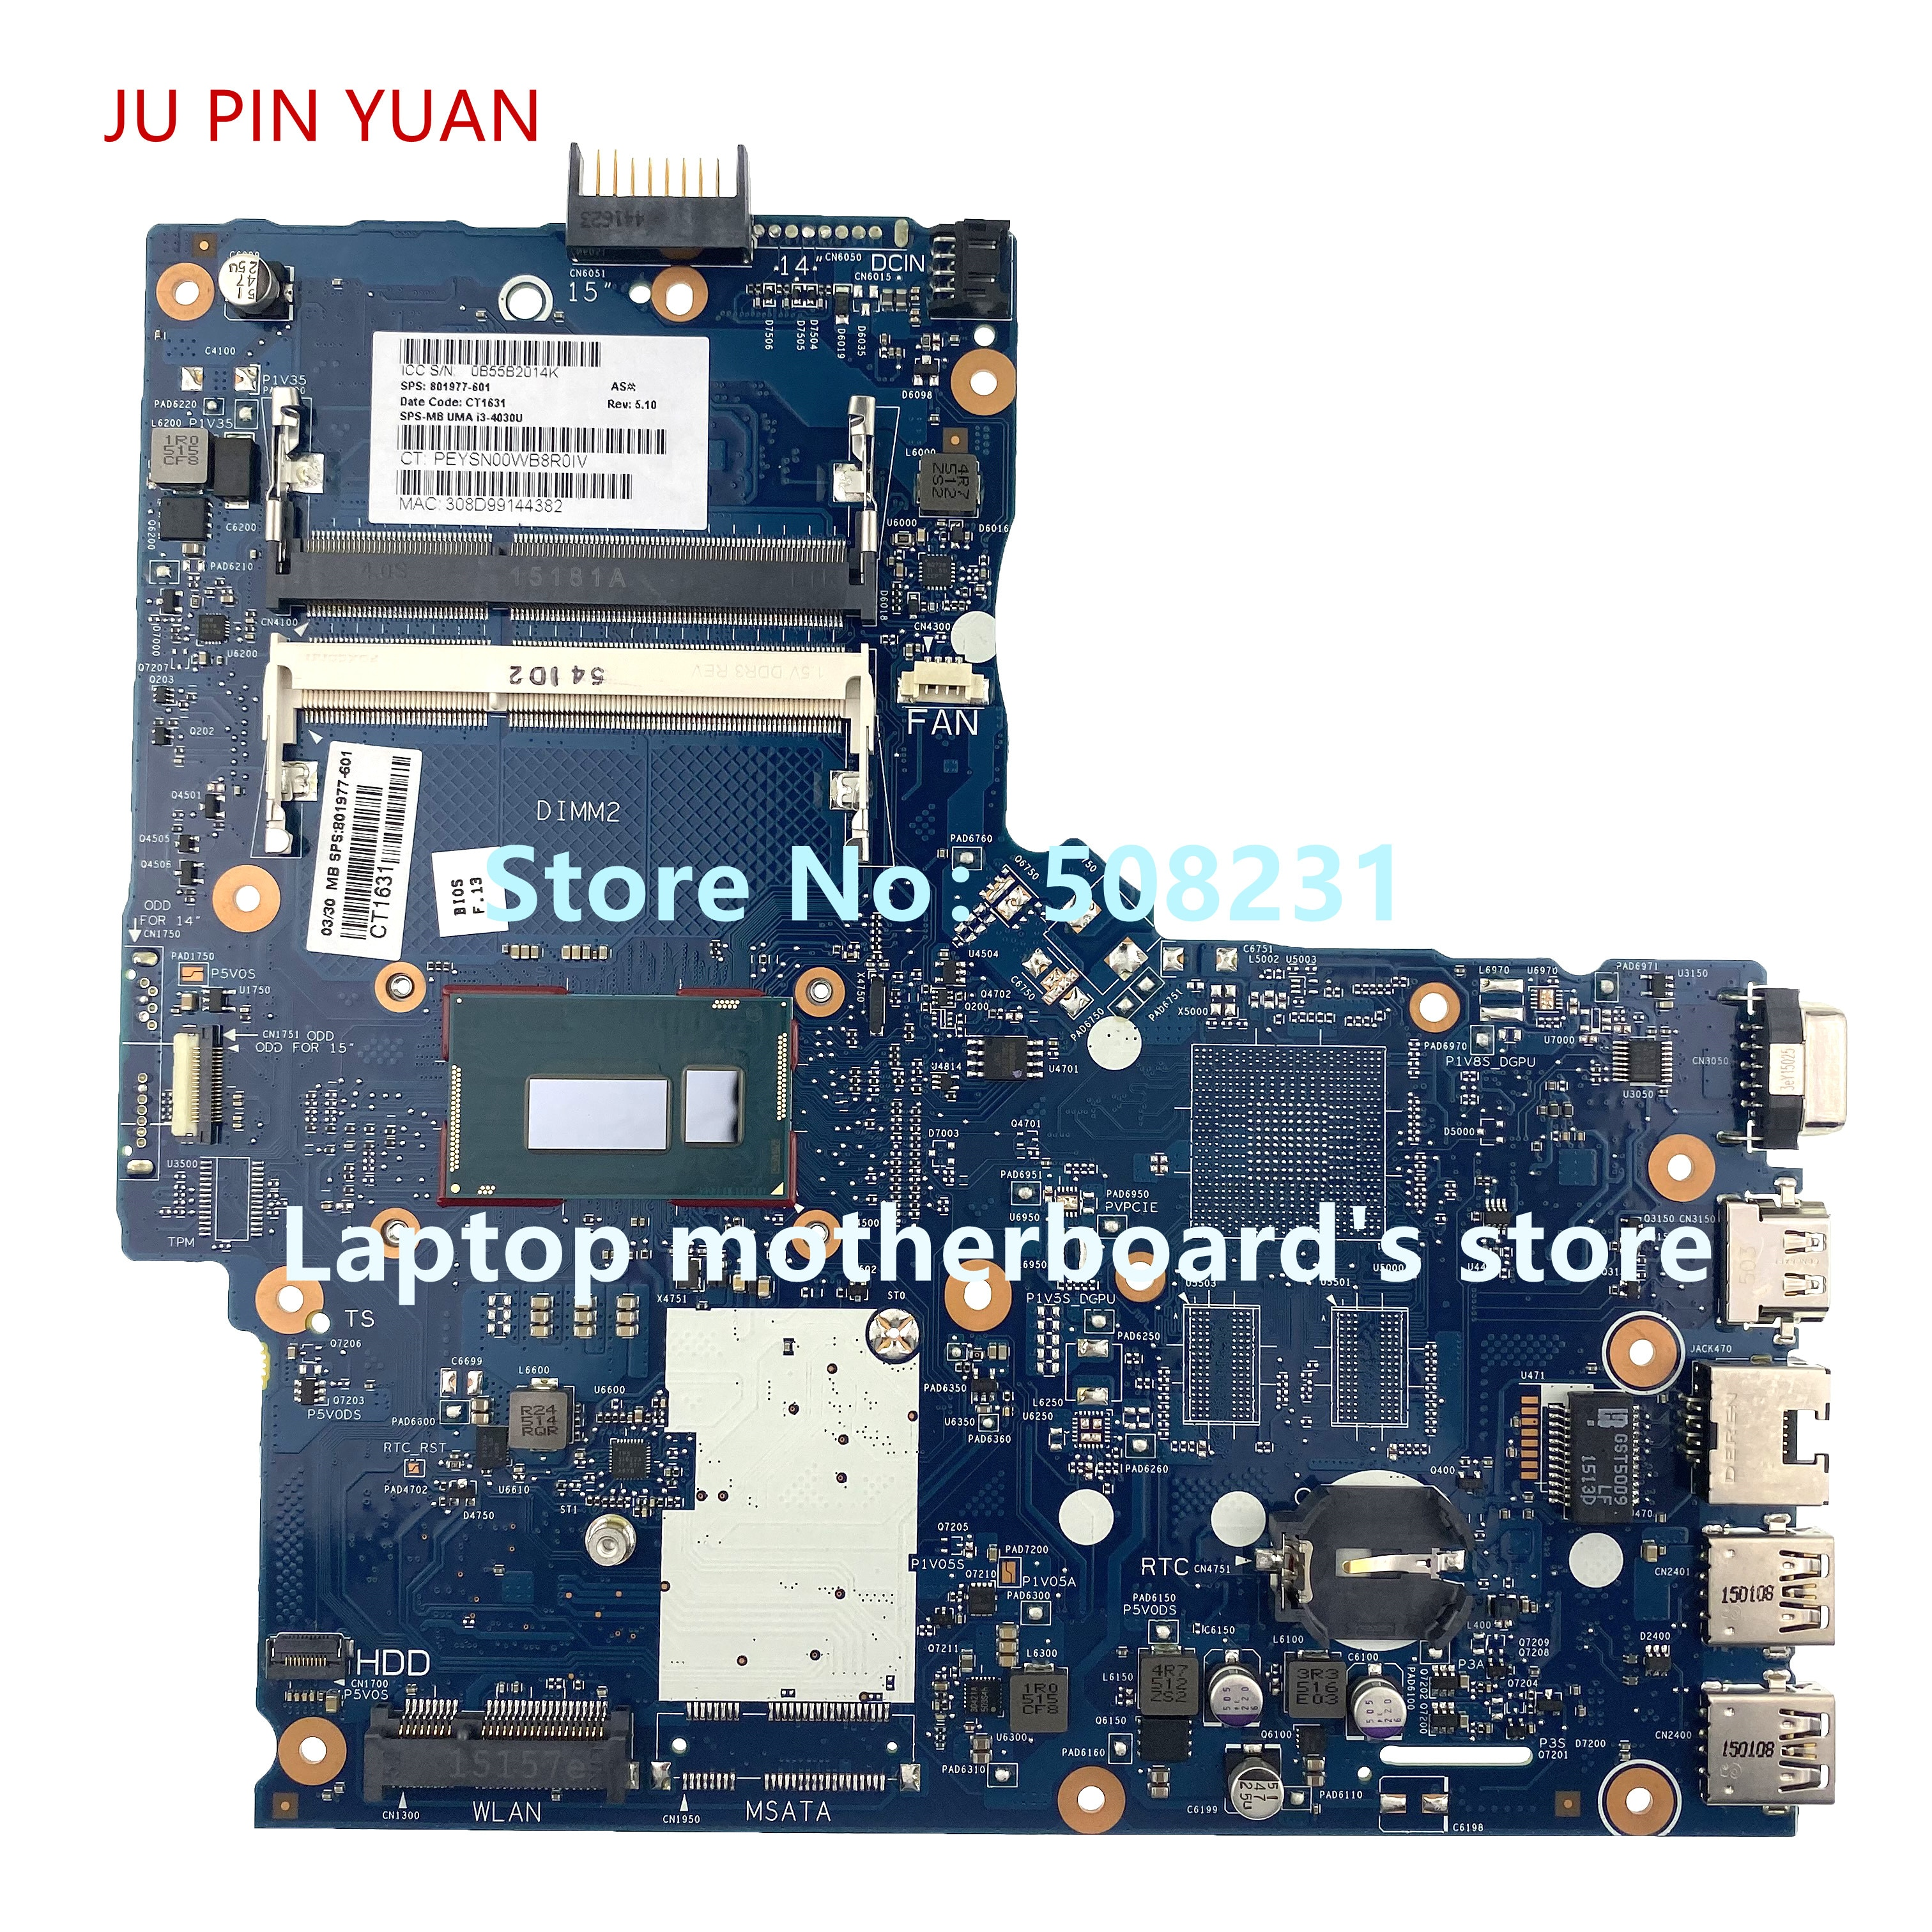 Ju pin yuan para HP 350 G2 placa base de computadora portátil con I3-4030U CPU 801977-501, 801977-001 6050A2677201 100% totalmente